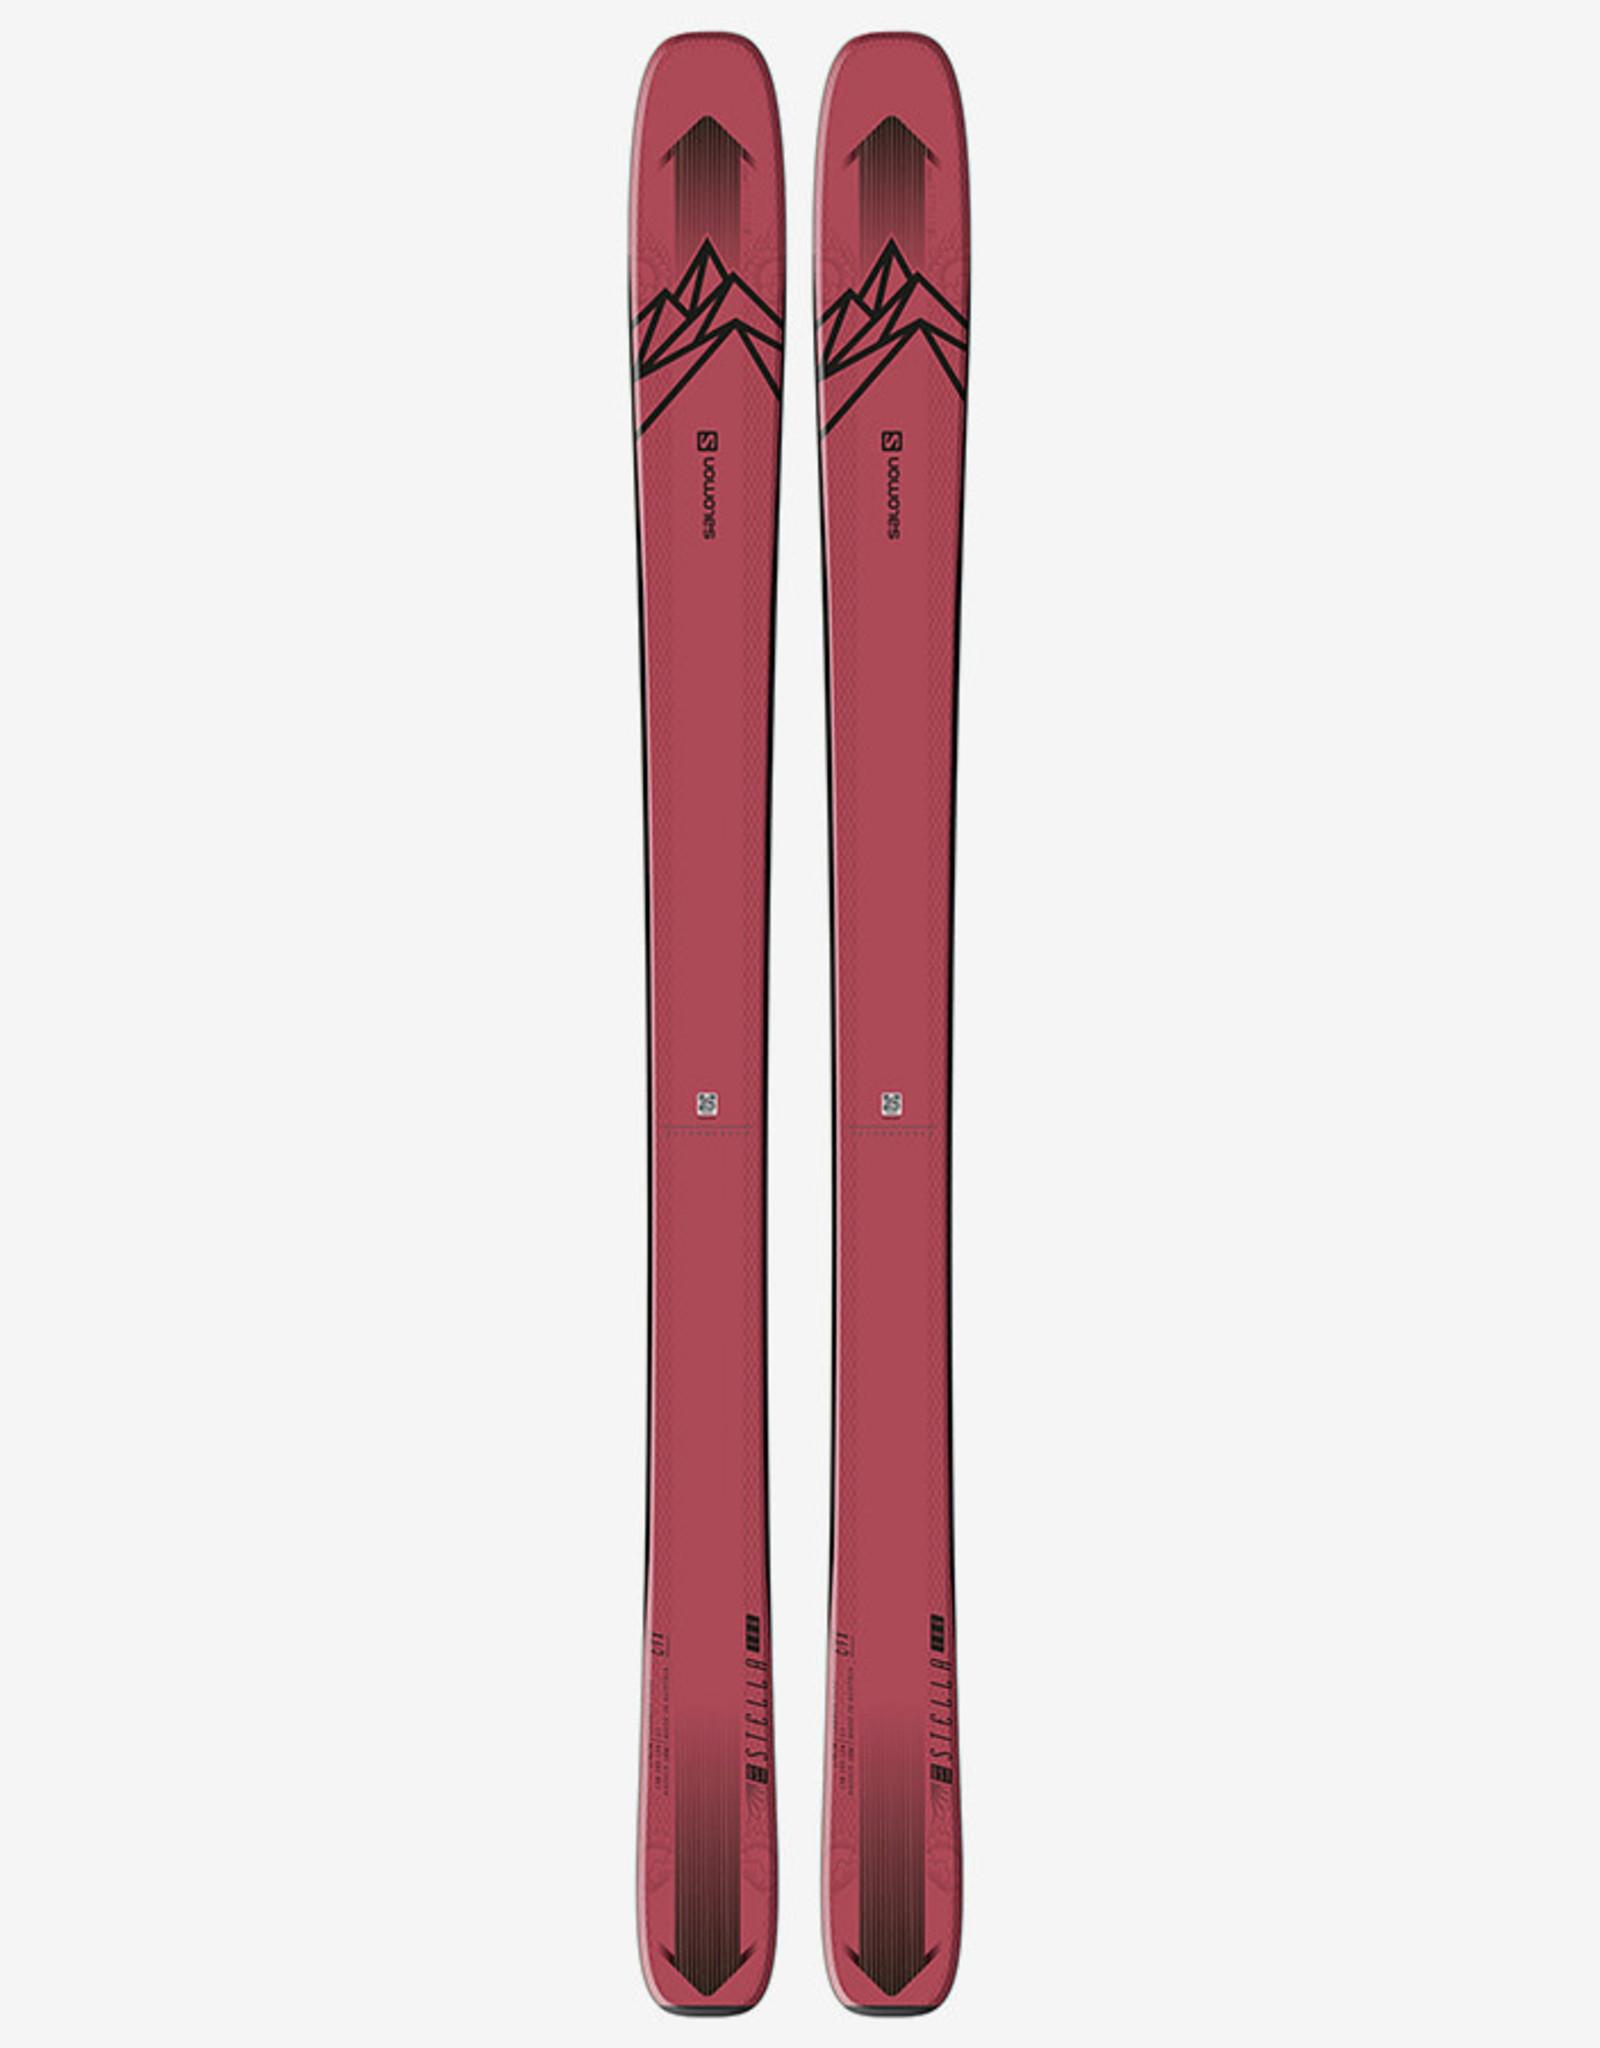 Salomon SALOMON Skis QST STELLA 106 (20/21)